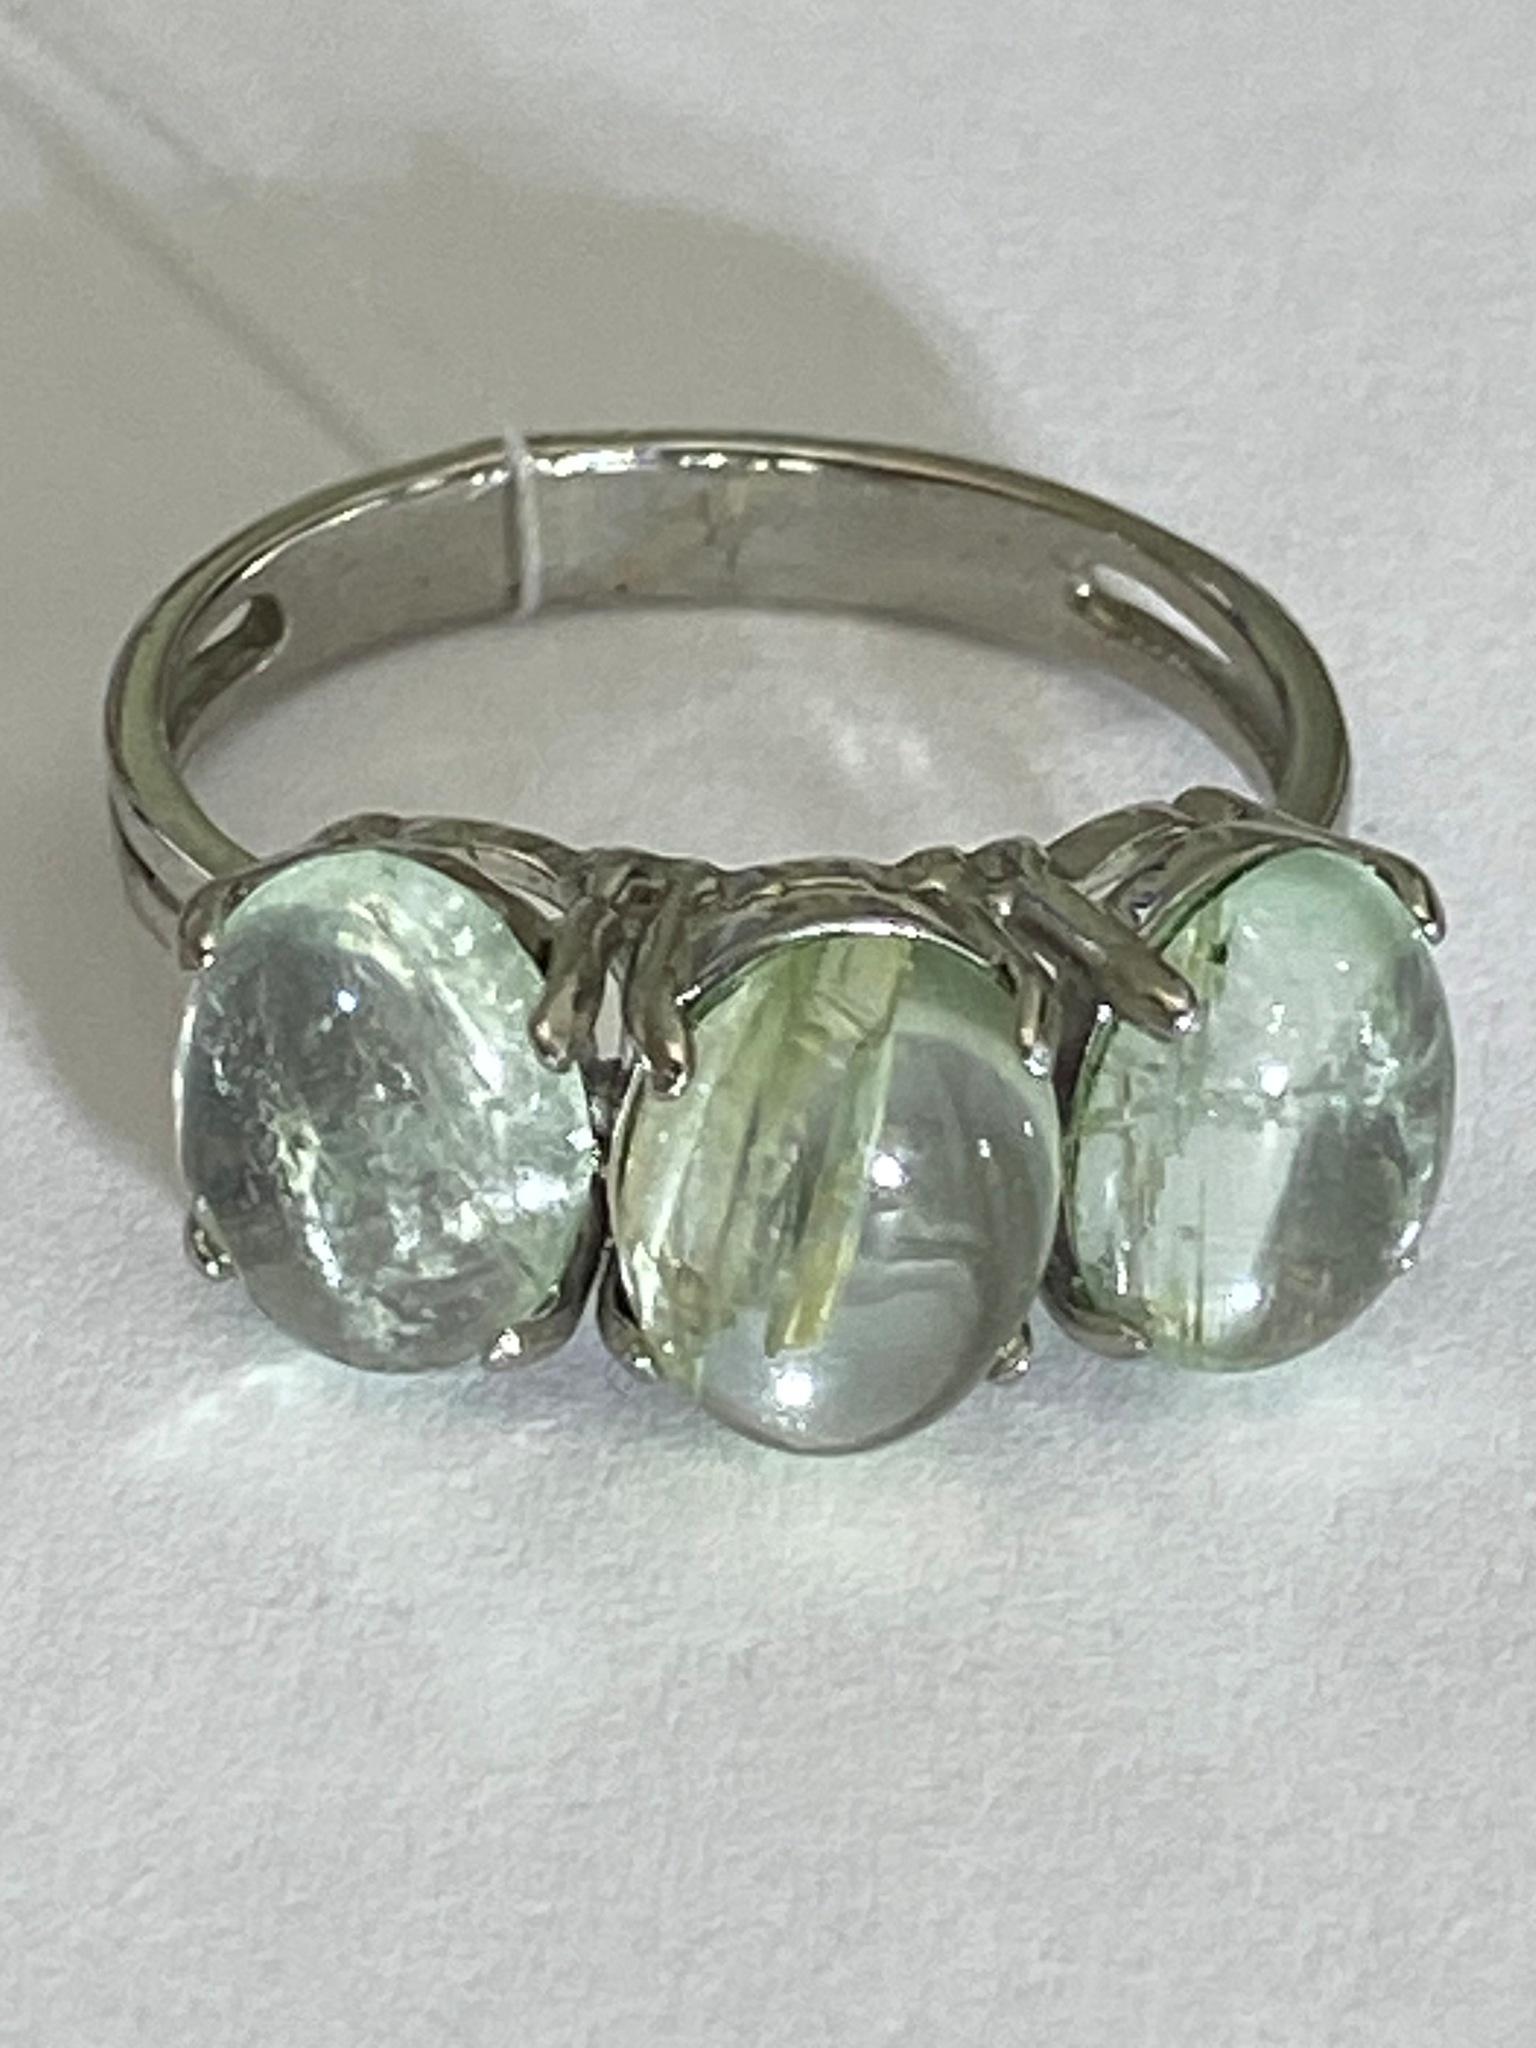 Дези-аквамарин (кольцо из серебра)